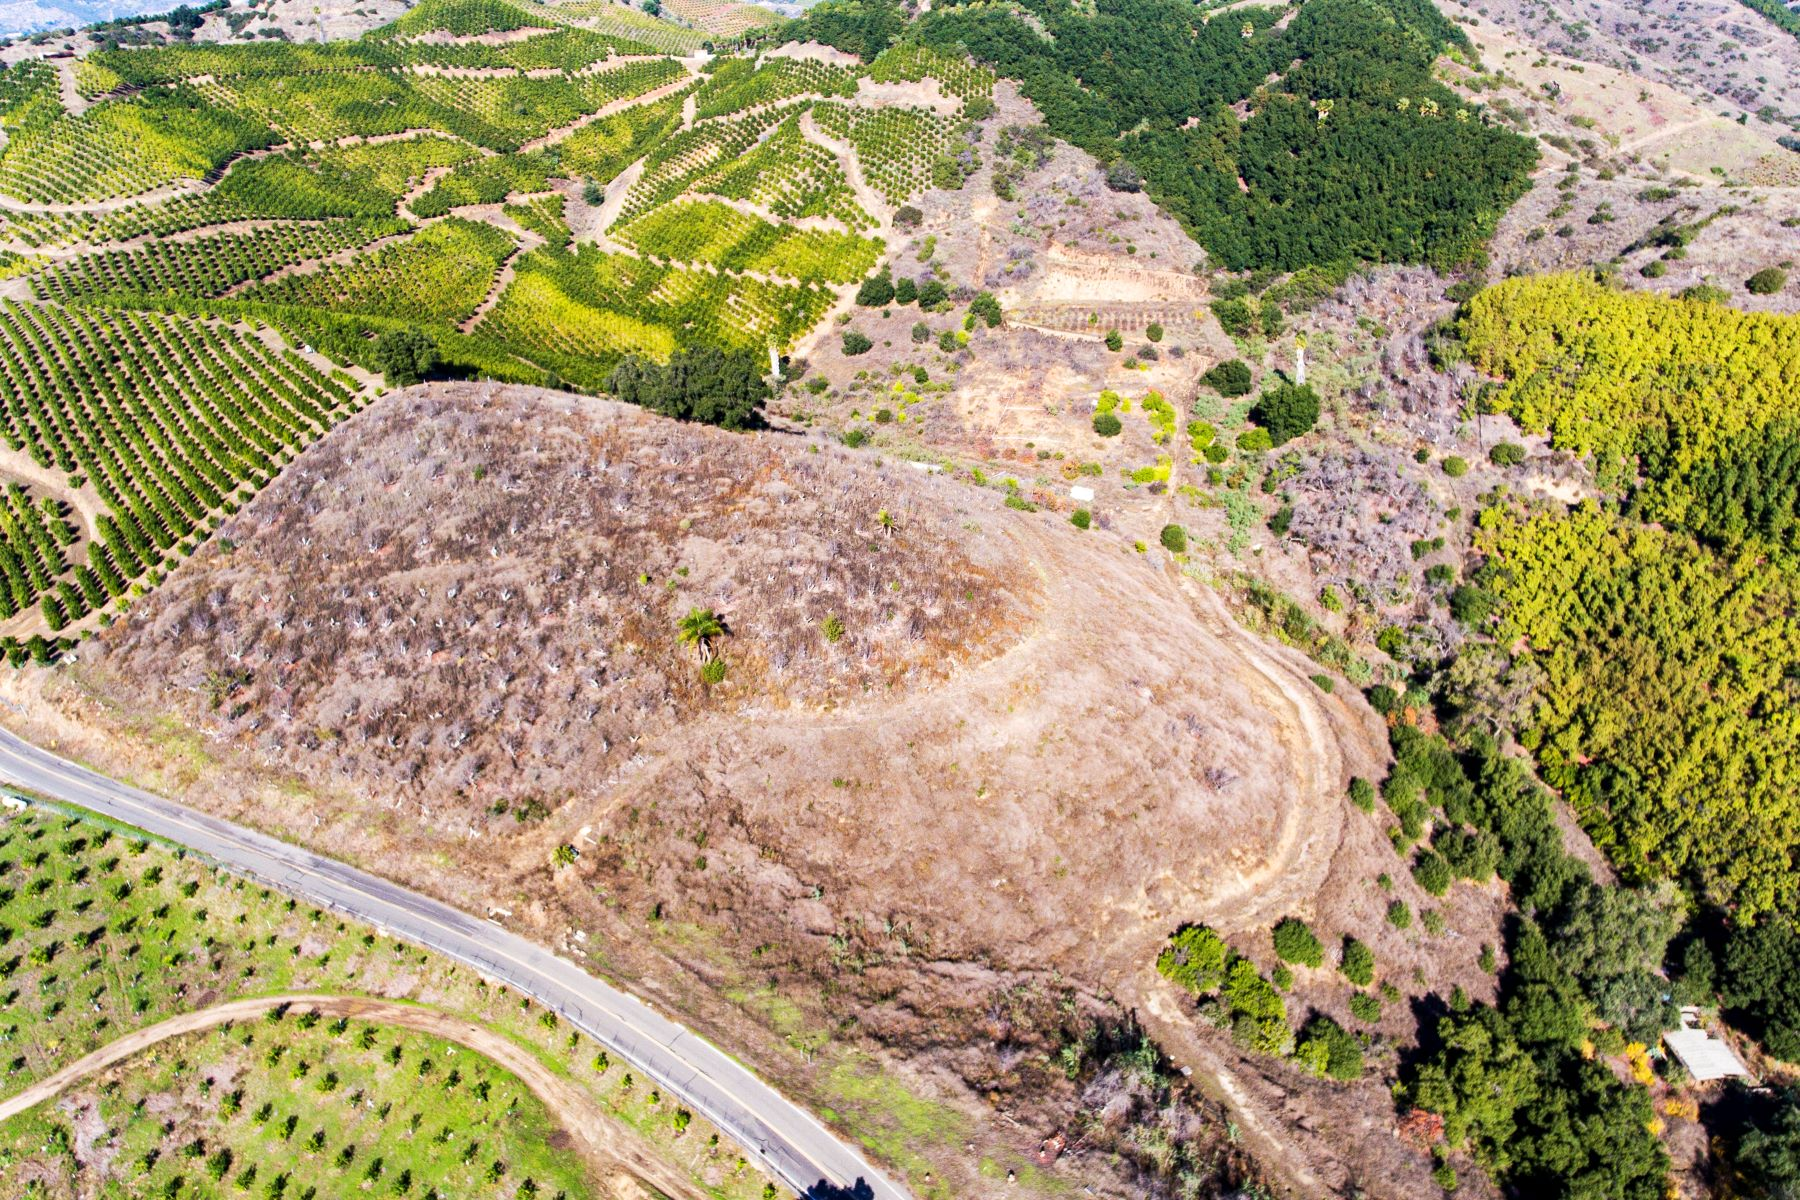 Terreno para Venda às 46340 Avenida Tierra, Temecula Temecula, Califórnia 92590 Estados Unidos